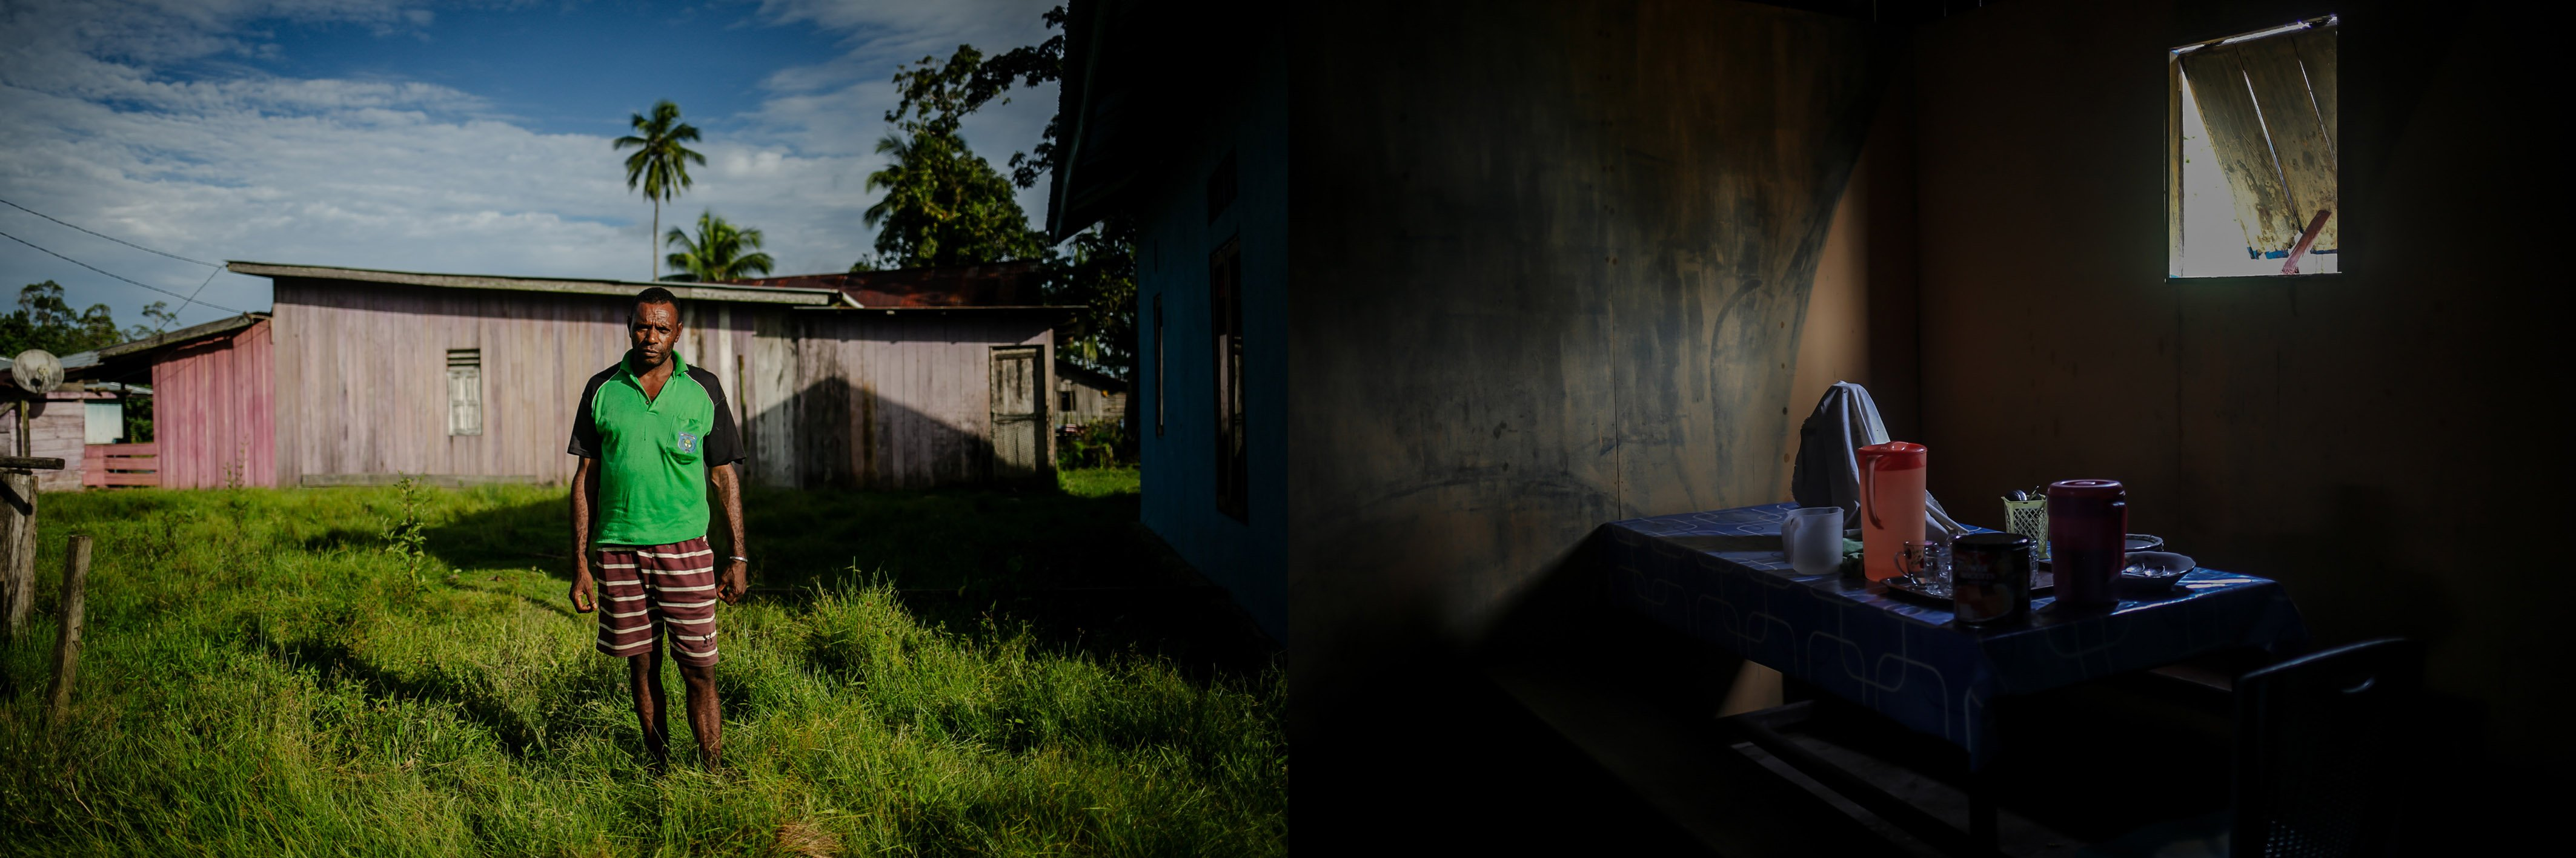 Samuel Ketumlas (48) berdiri di atas tanah adat Suku Moi di Distrik Segun, Kabupaten Sorong, Papua Barat, Minggu, (19/9/2021). Selaku sekretaris kampung adat saya menyatakan tidak akan mengizinkan masuknya industri kelapa sawit disini, mulai dari kami lahir sudah diberi makan dan minum dari hasil hutan adat ini oleh orang tua kami. Dengan janji palsu apapun kami tidak akan menerimanya demi menjaga adat dan keturunan kami di masa depan nanti.